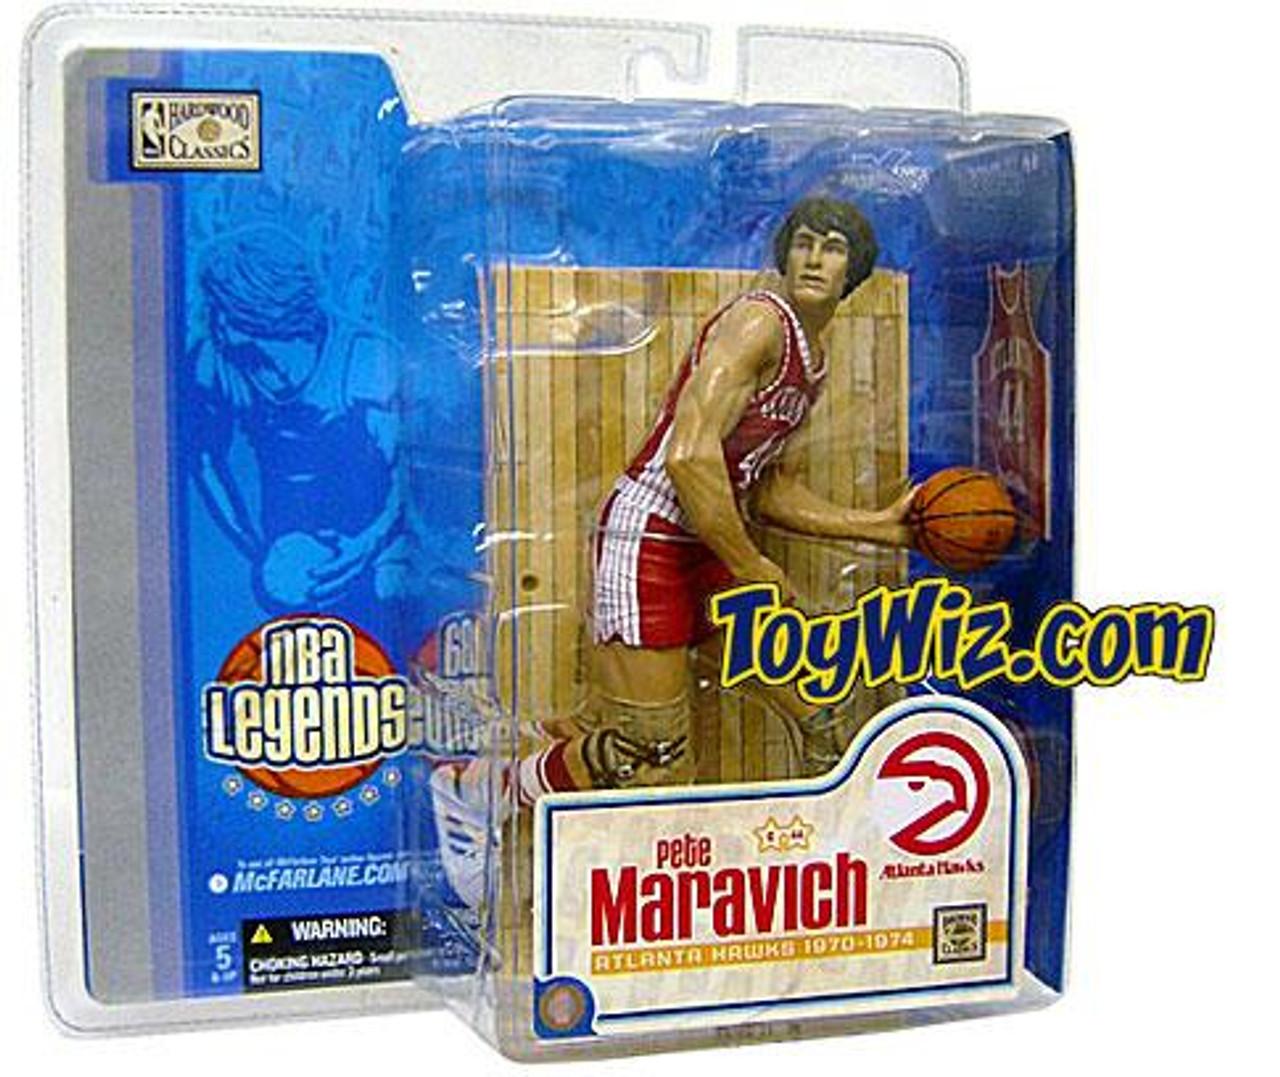 McFarlane Toys NBA Atlanta Hawks Sports Picks Legends Series 1 Pete Maravich Action Figure [Red Jersey Variant]